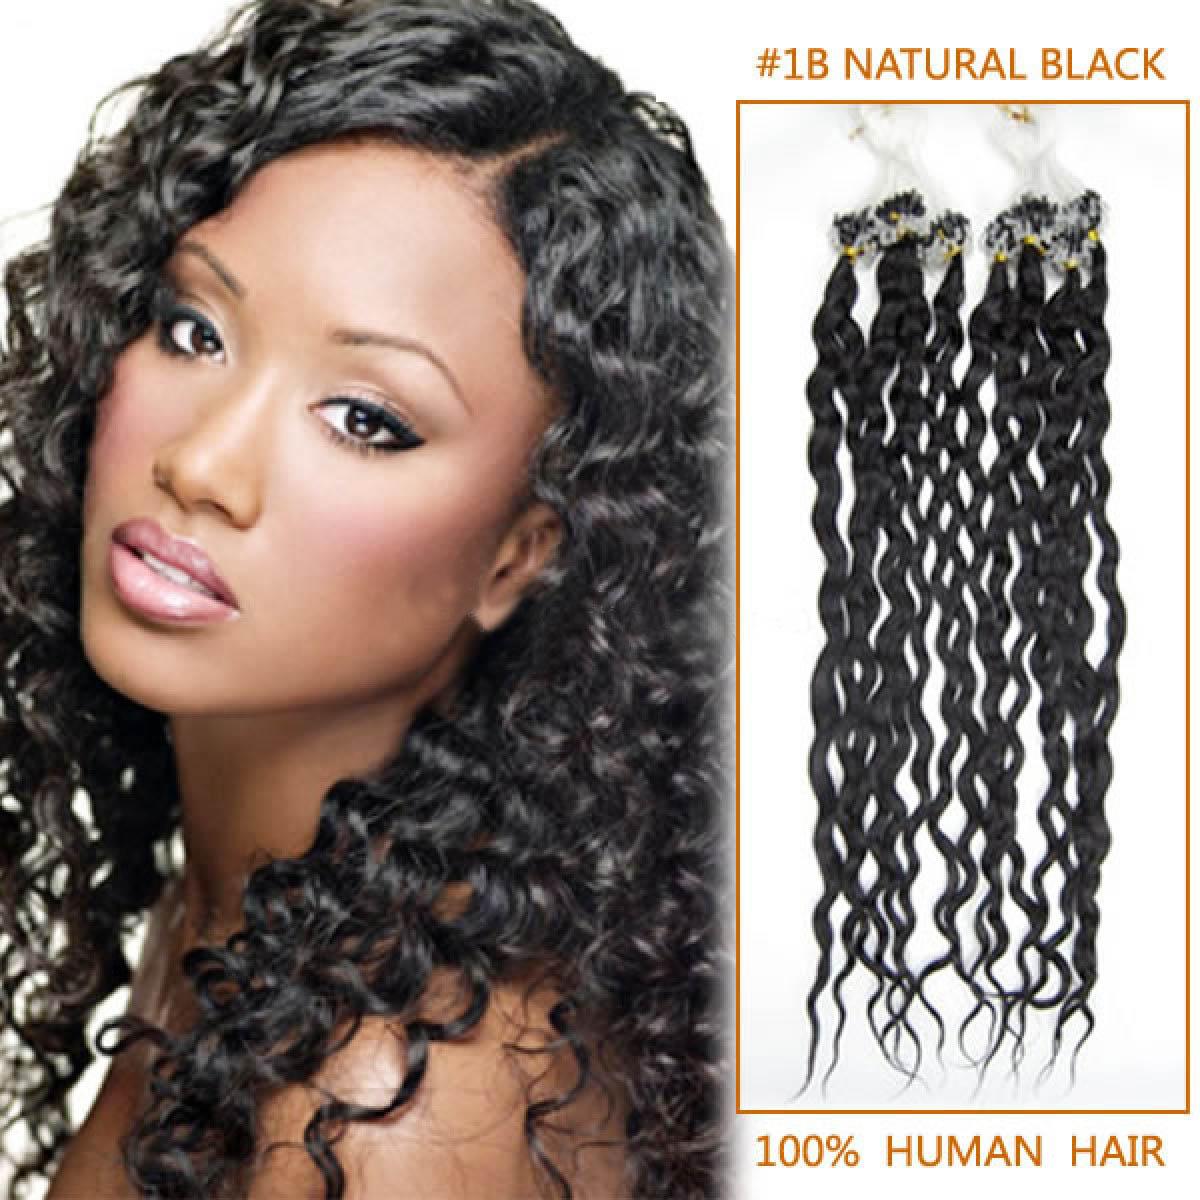 34 Inch Delicate 1b Natural Black Curly Micro Loop Hair Extensions